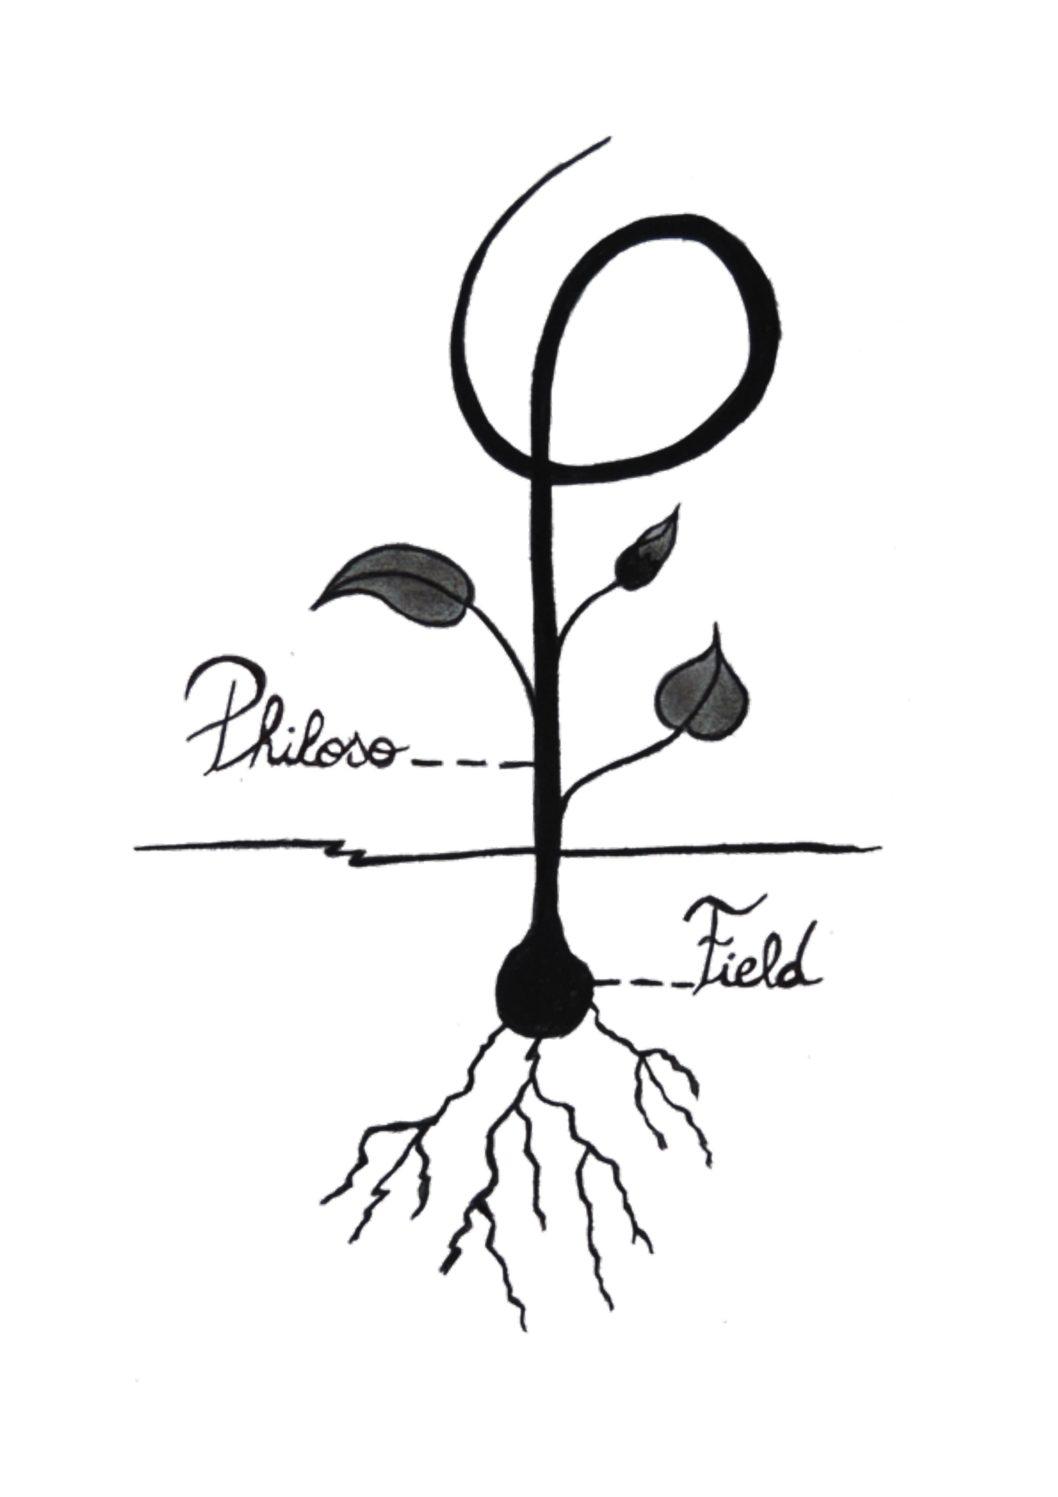 PhilosoField